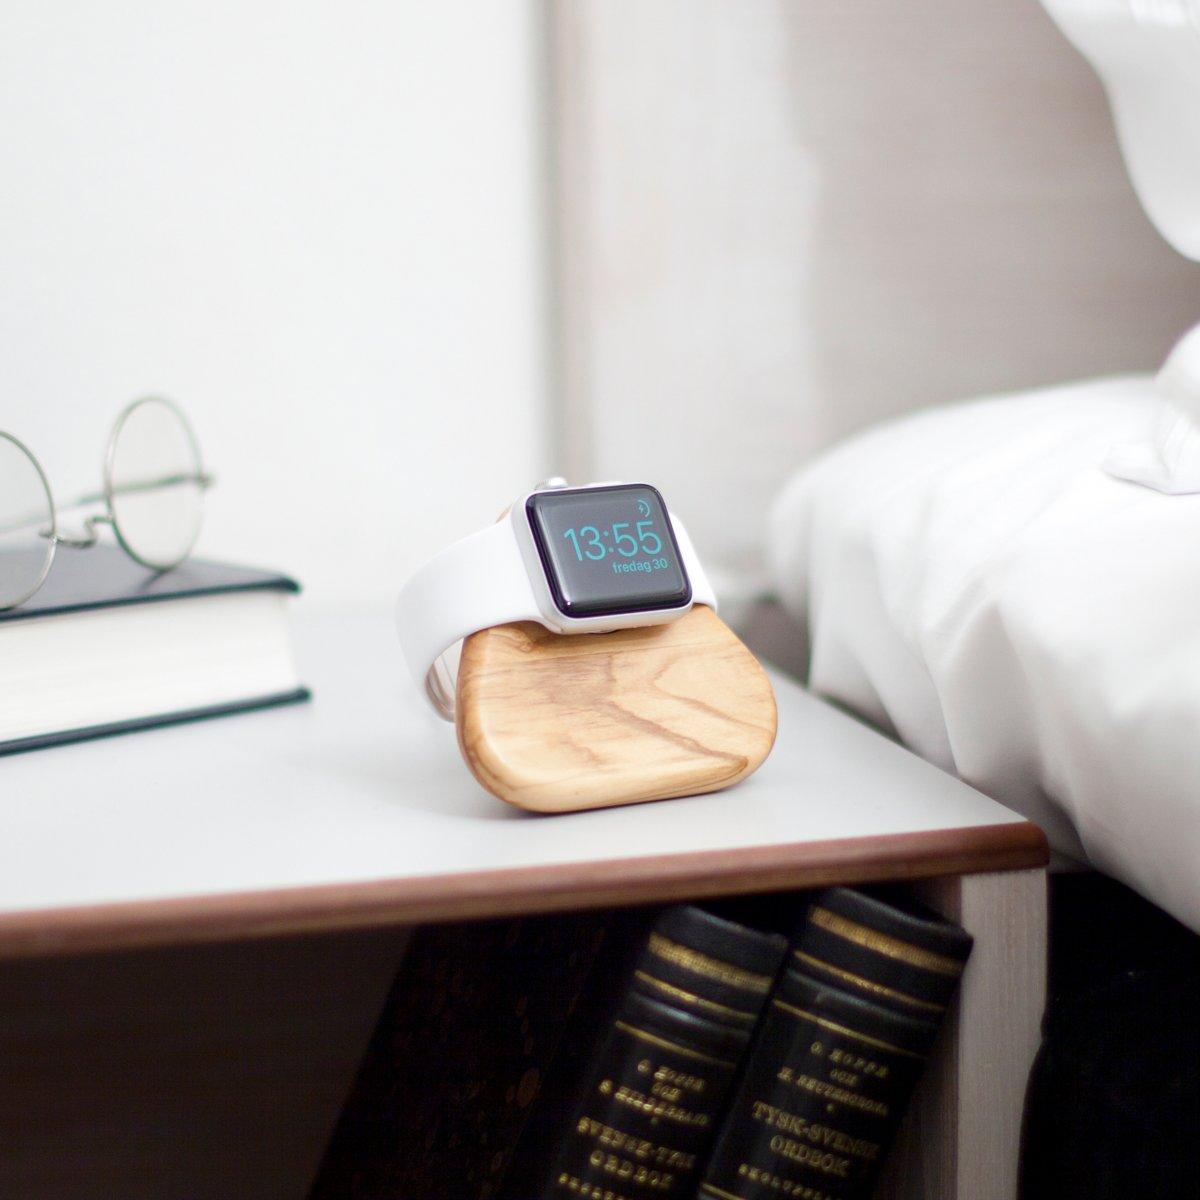 Bosign Apple Watch Standaard – Oplaaddock  -  Docking Station – Oplaadstation - Olijfhout - Tetra kopen